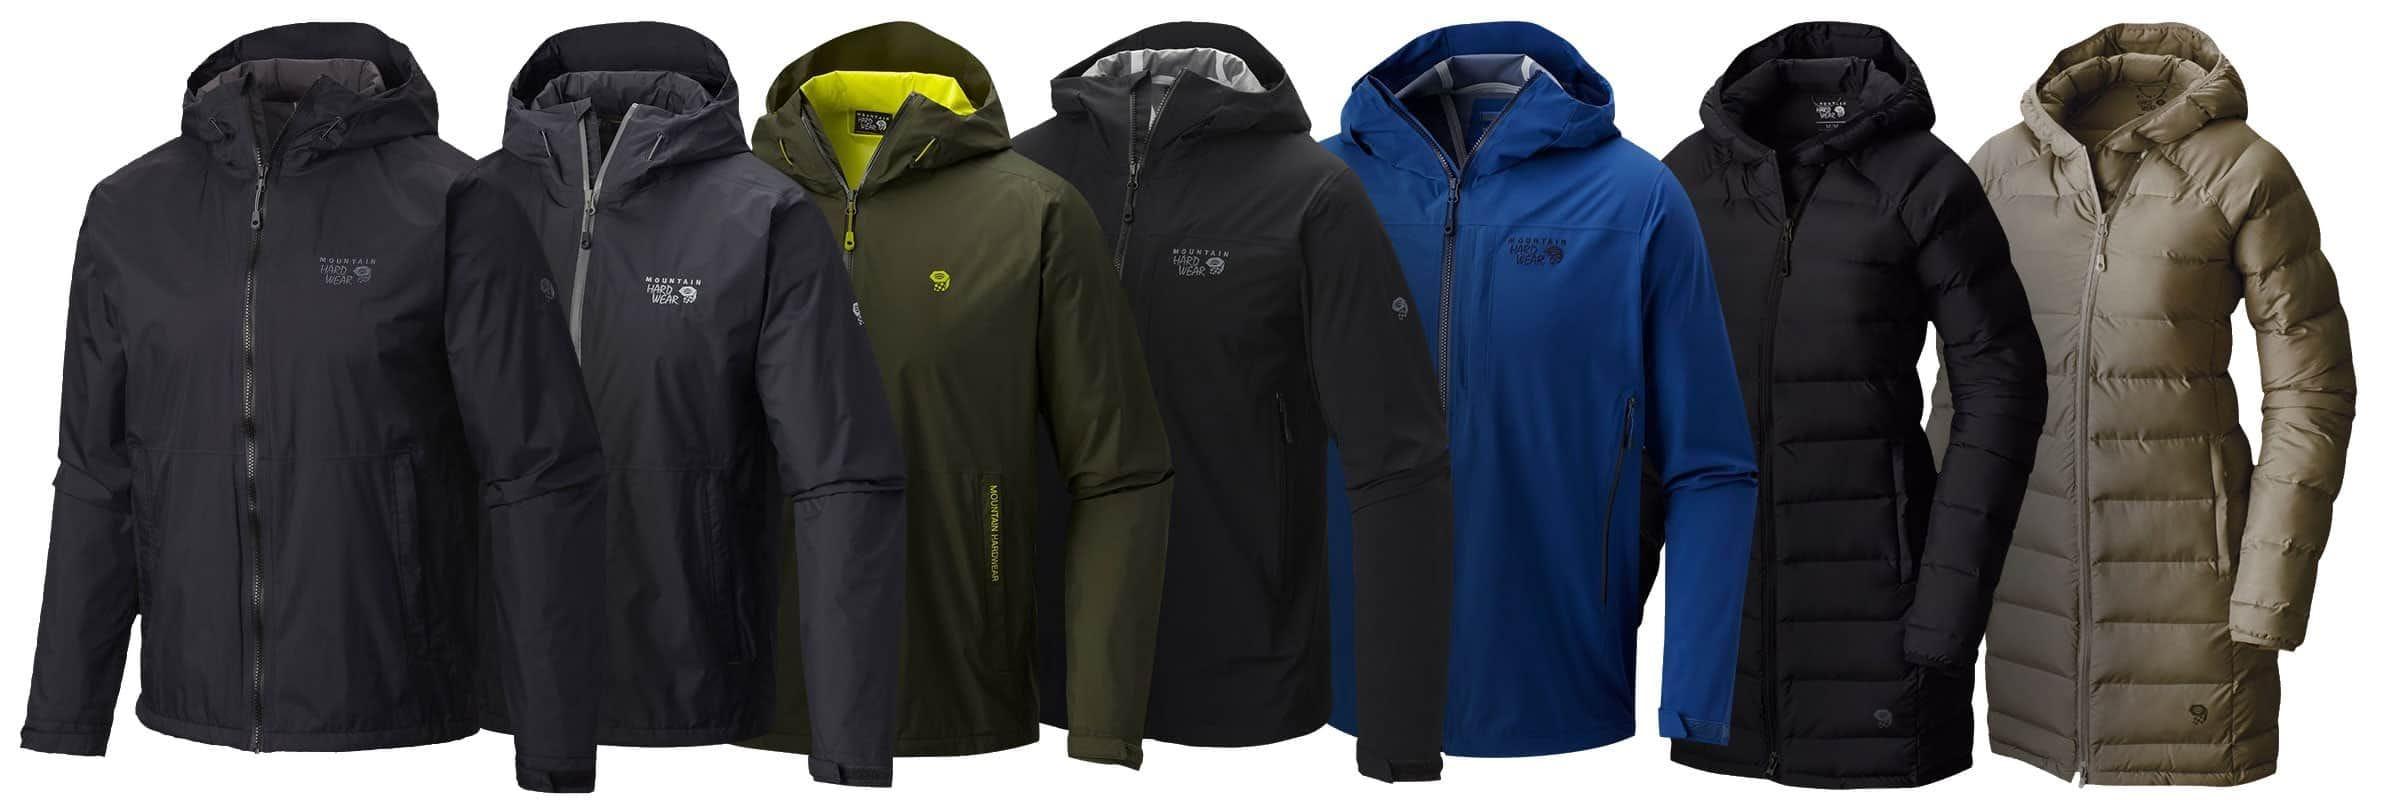 dry.q jackets